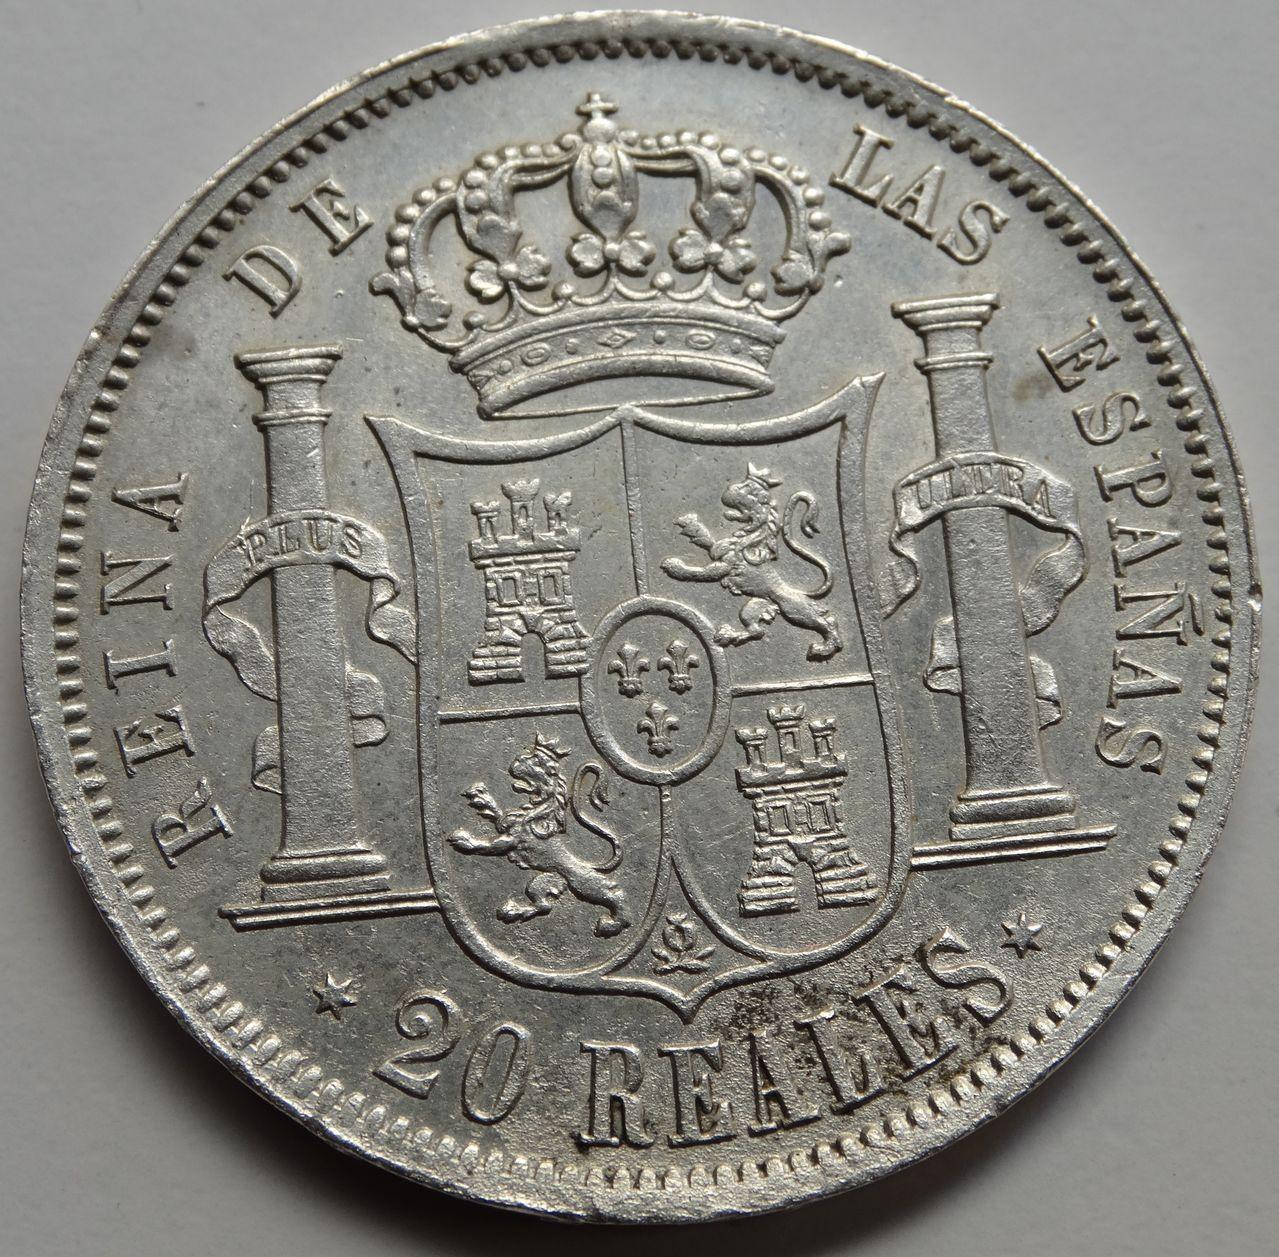 20 REALES ISABEL II 1851 MADRID DSC02600